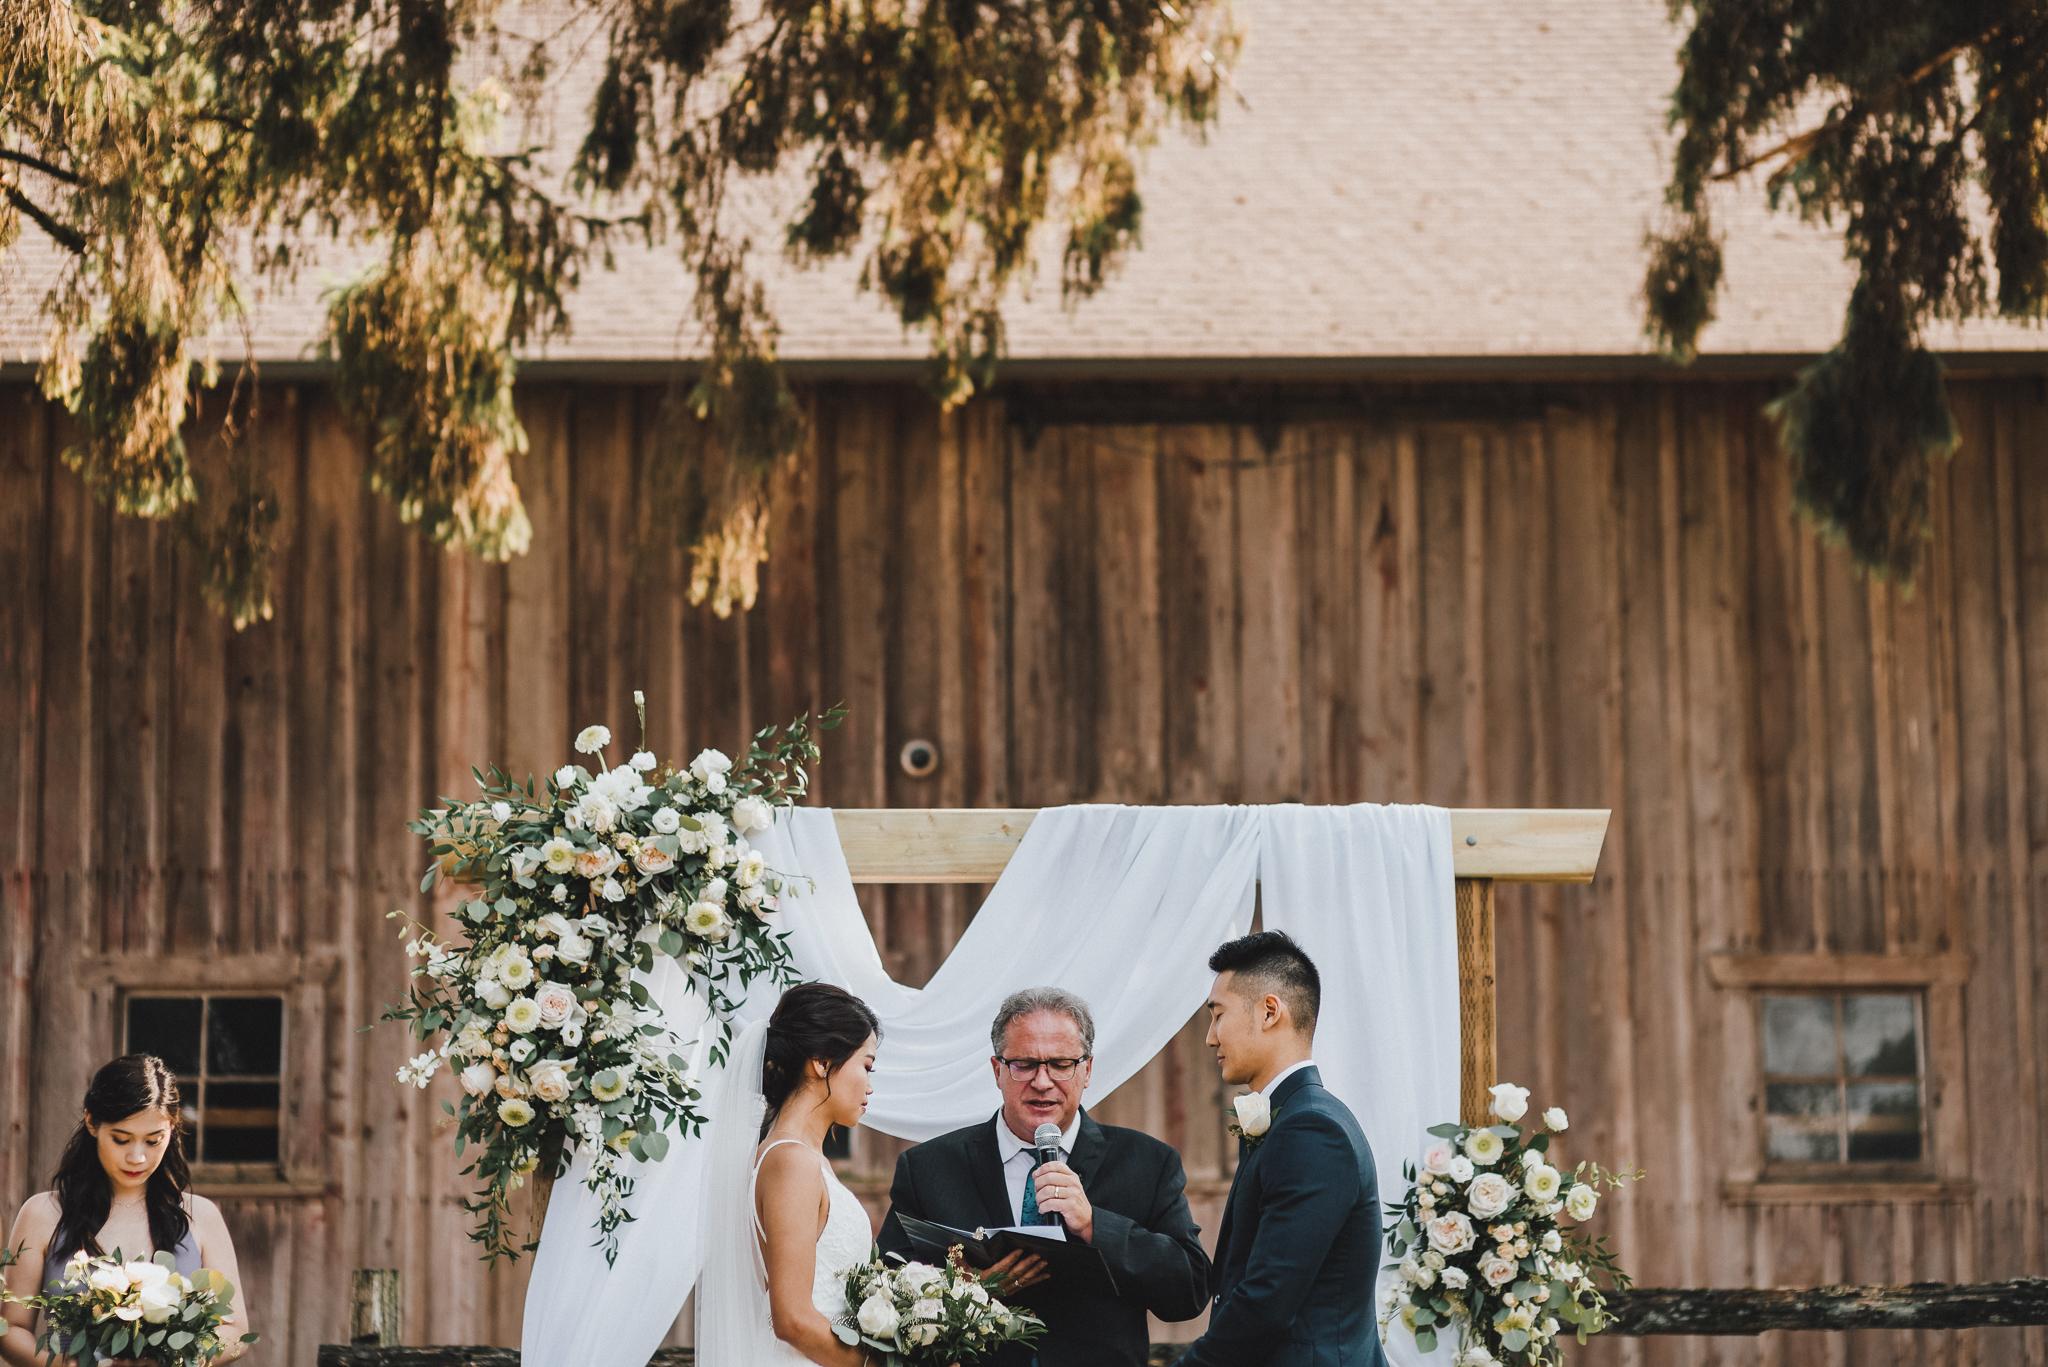 wellbrookwinerywedding-carrieaugustine-thekoebels-32.jpg